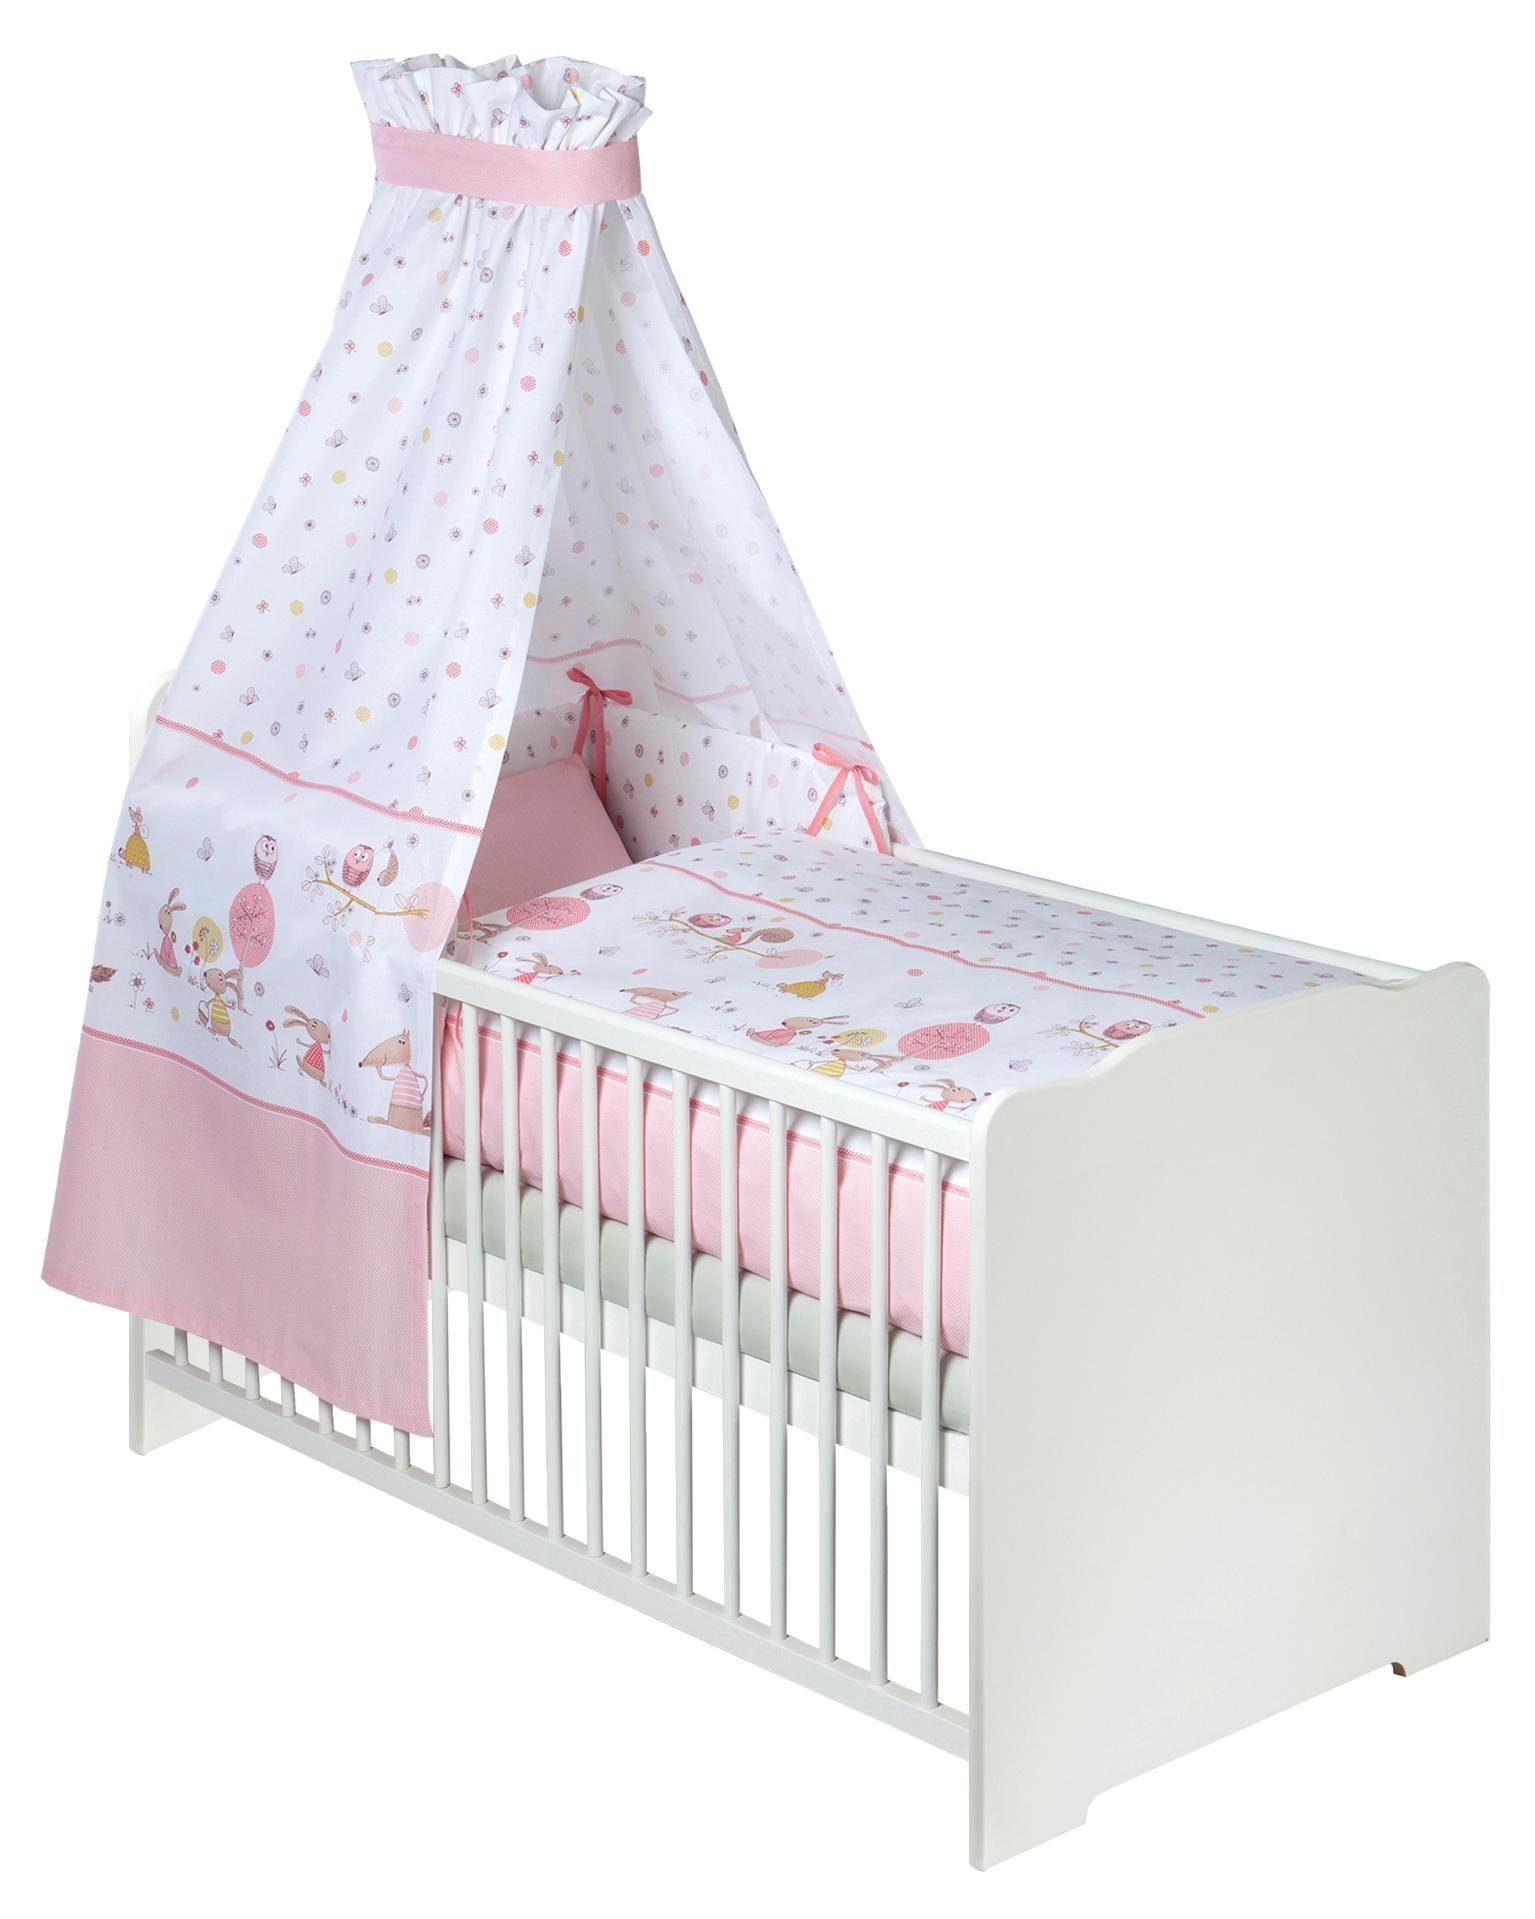 Zöllner 7-tlg. Komplettbett »Tierwelt rosa«, Babybett+ Matratze+ Himmelstange+ Himmel+ Nestchen+ Bettwäsche